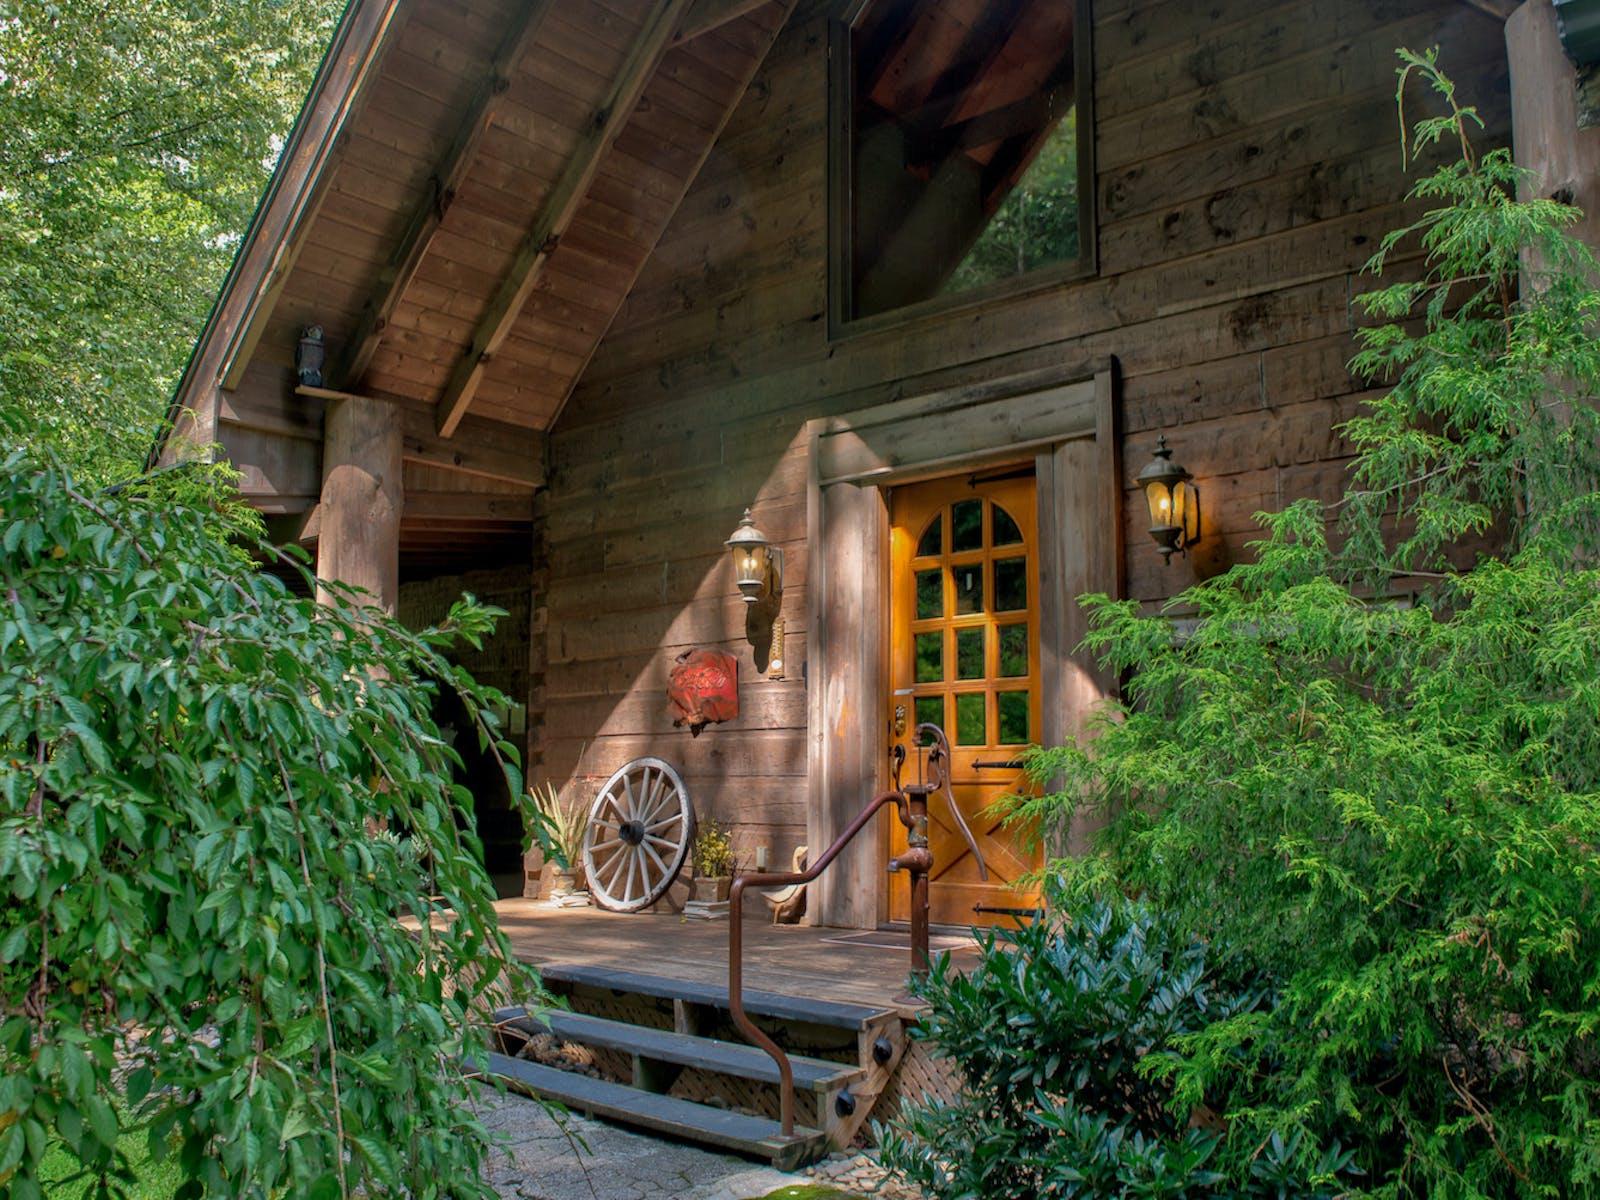 A pristine cabin in the woods